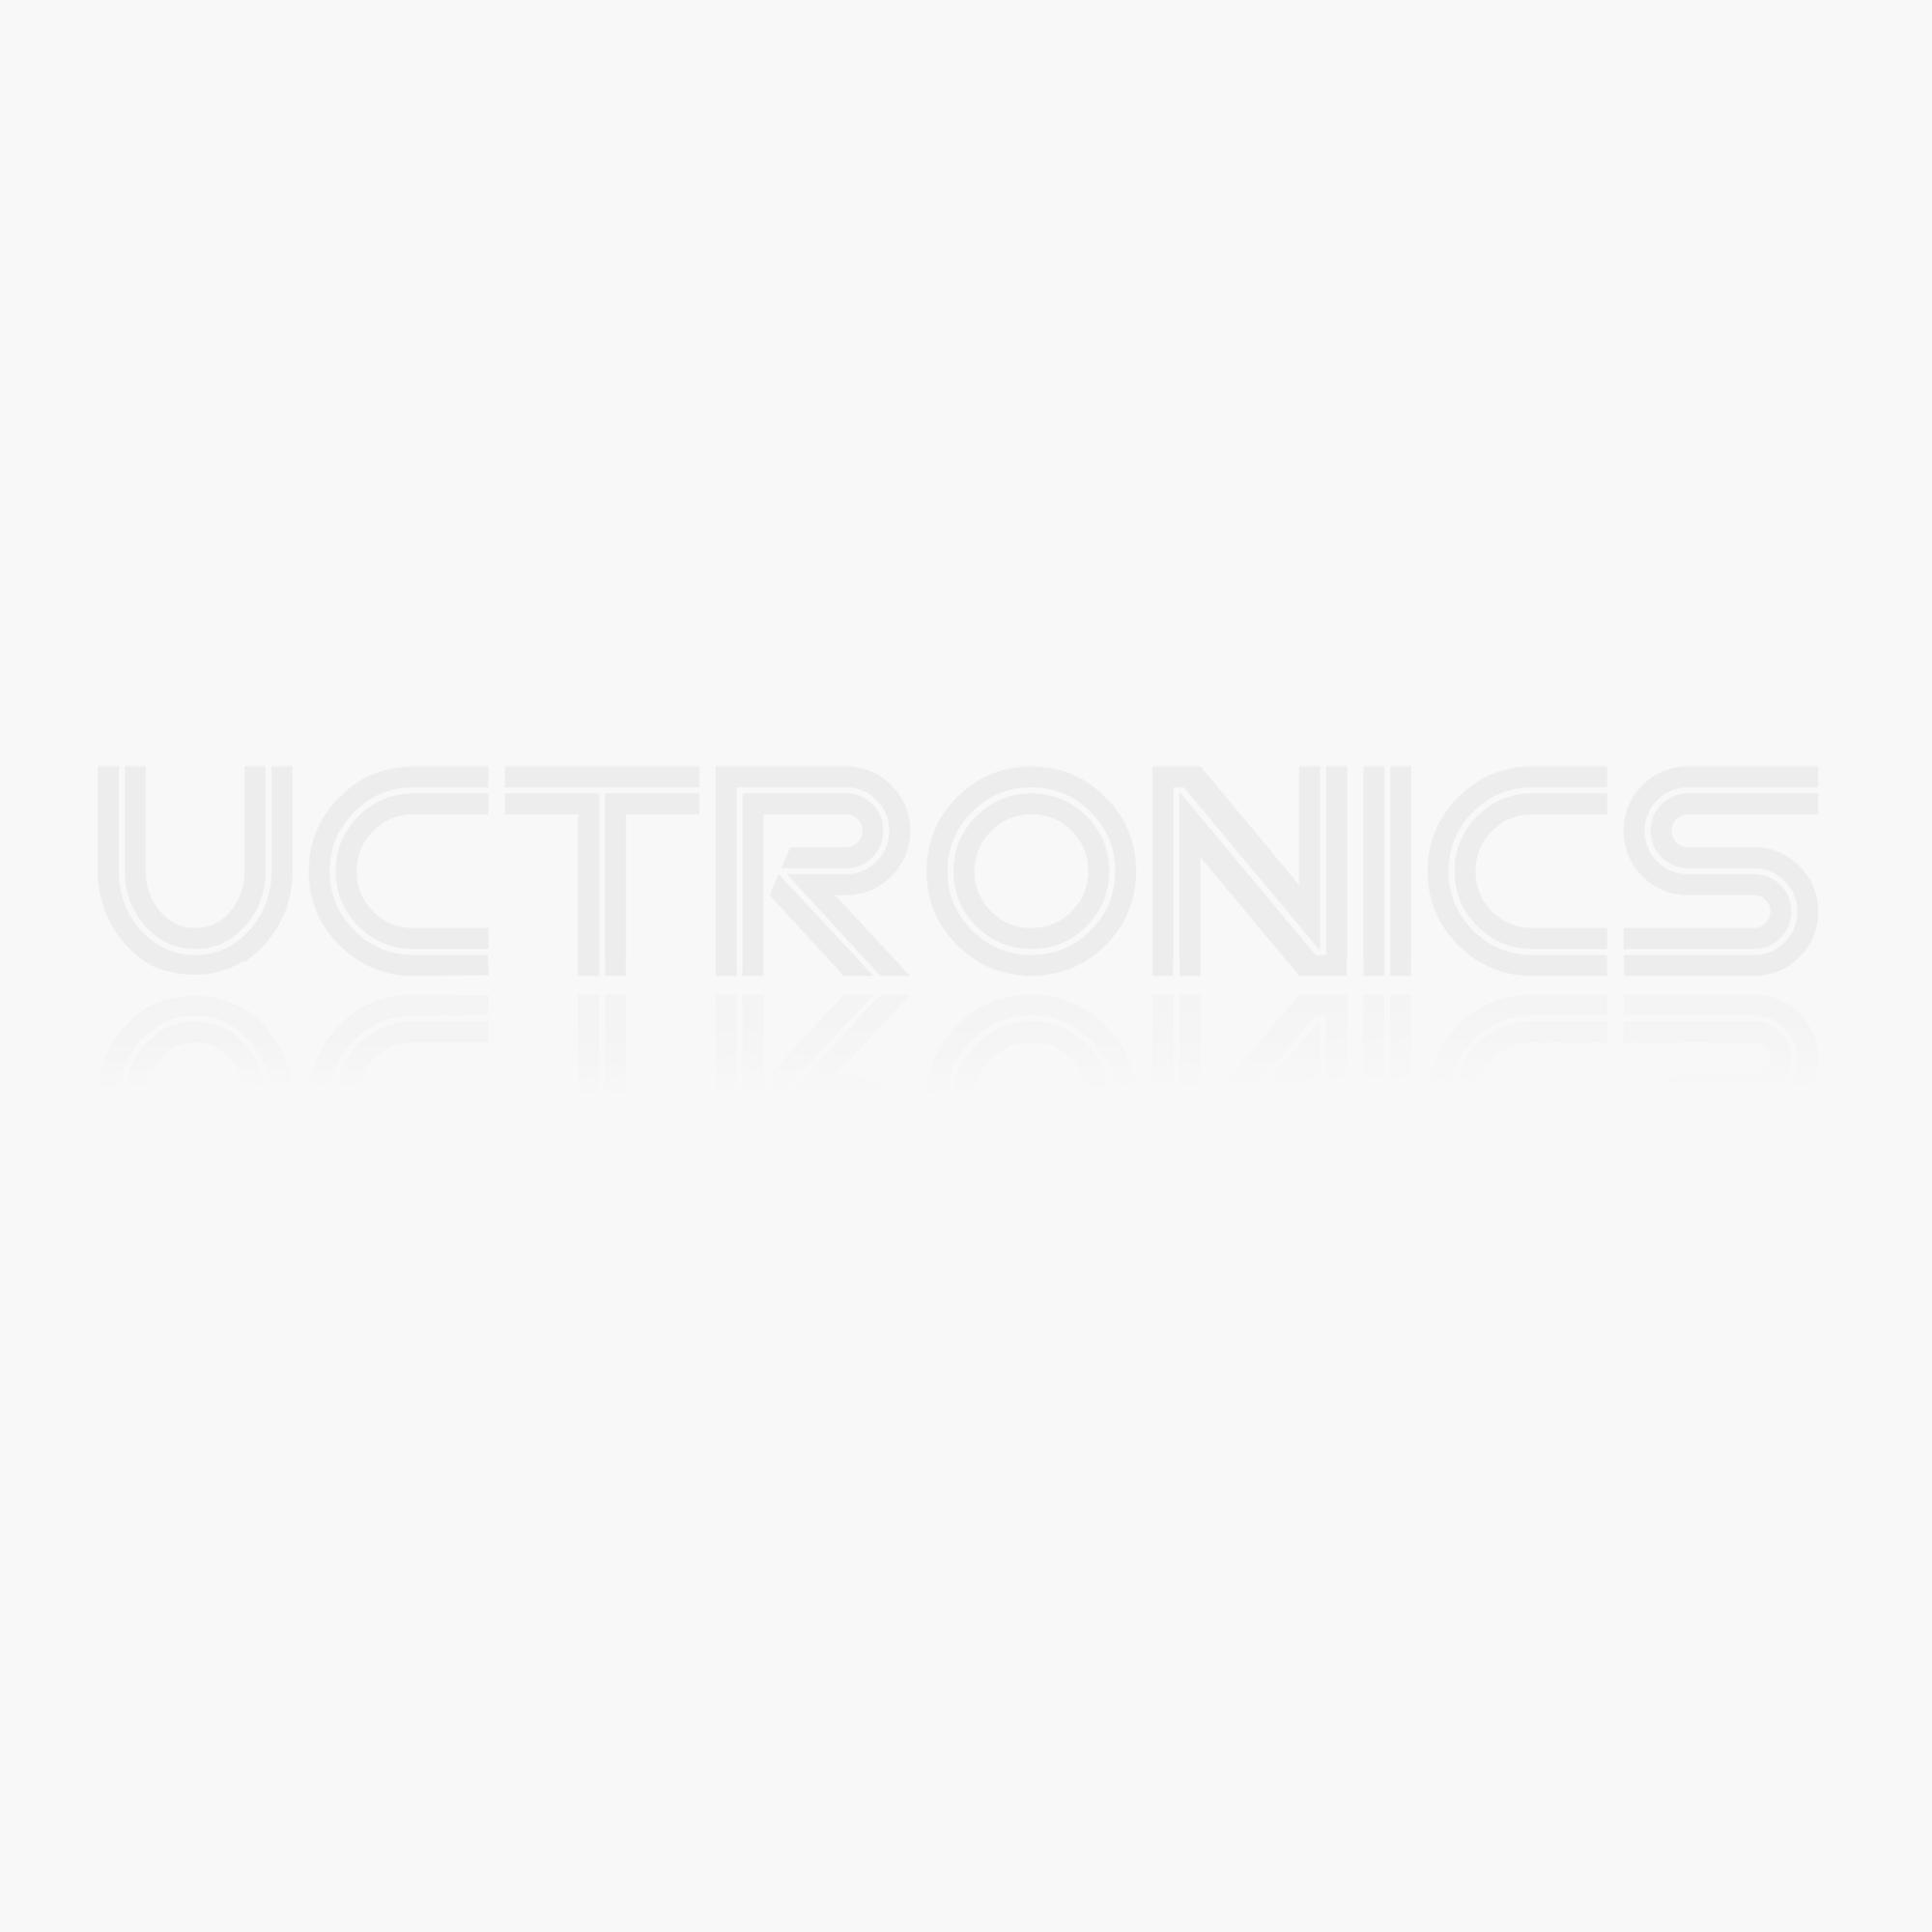 GY-32 MMA7361L tilt angle module triaxial accelerometer module